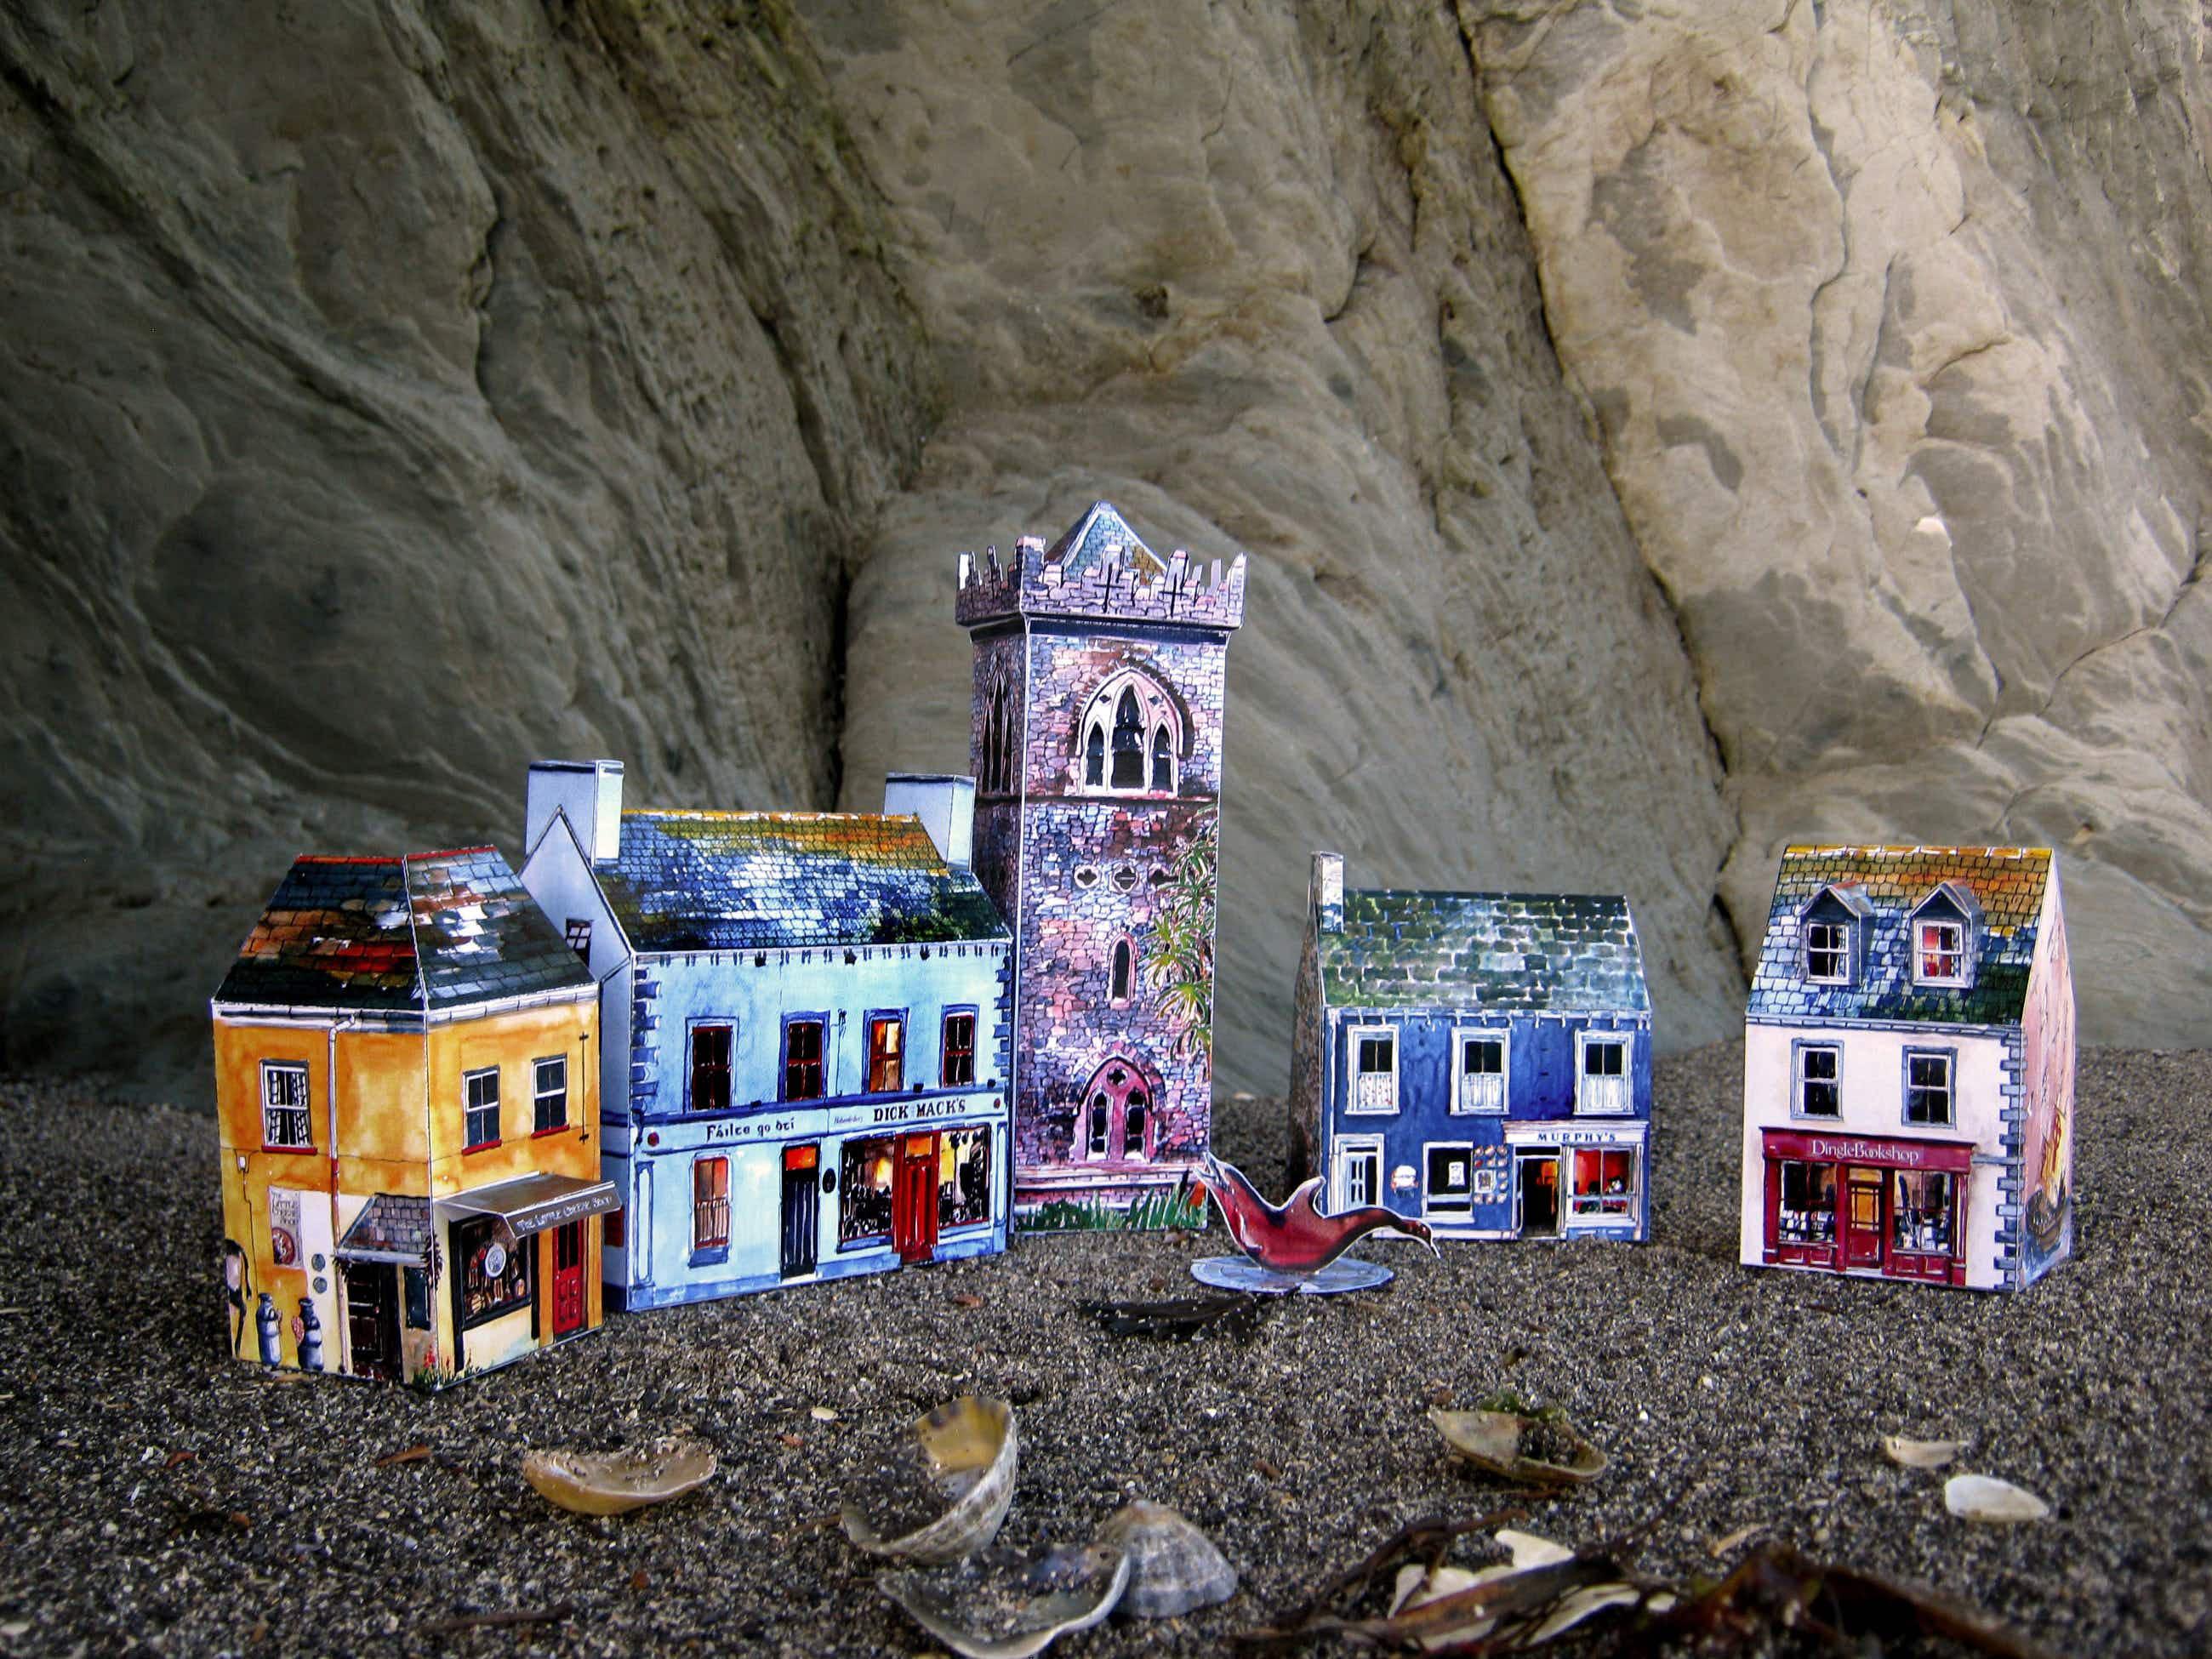 Bring home your very own tiny Irish village as a cute souvenir